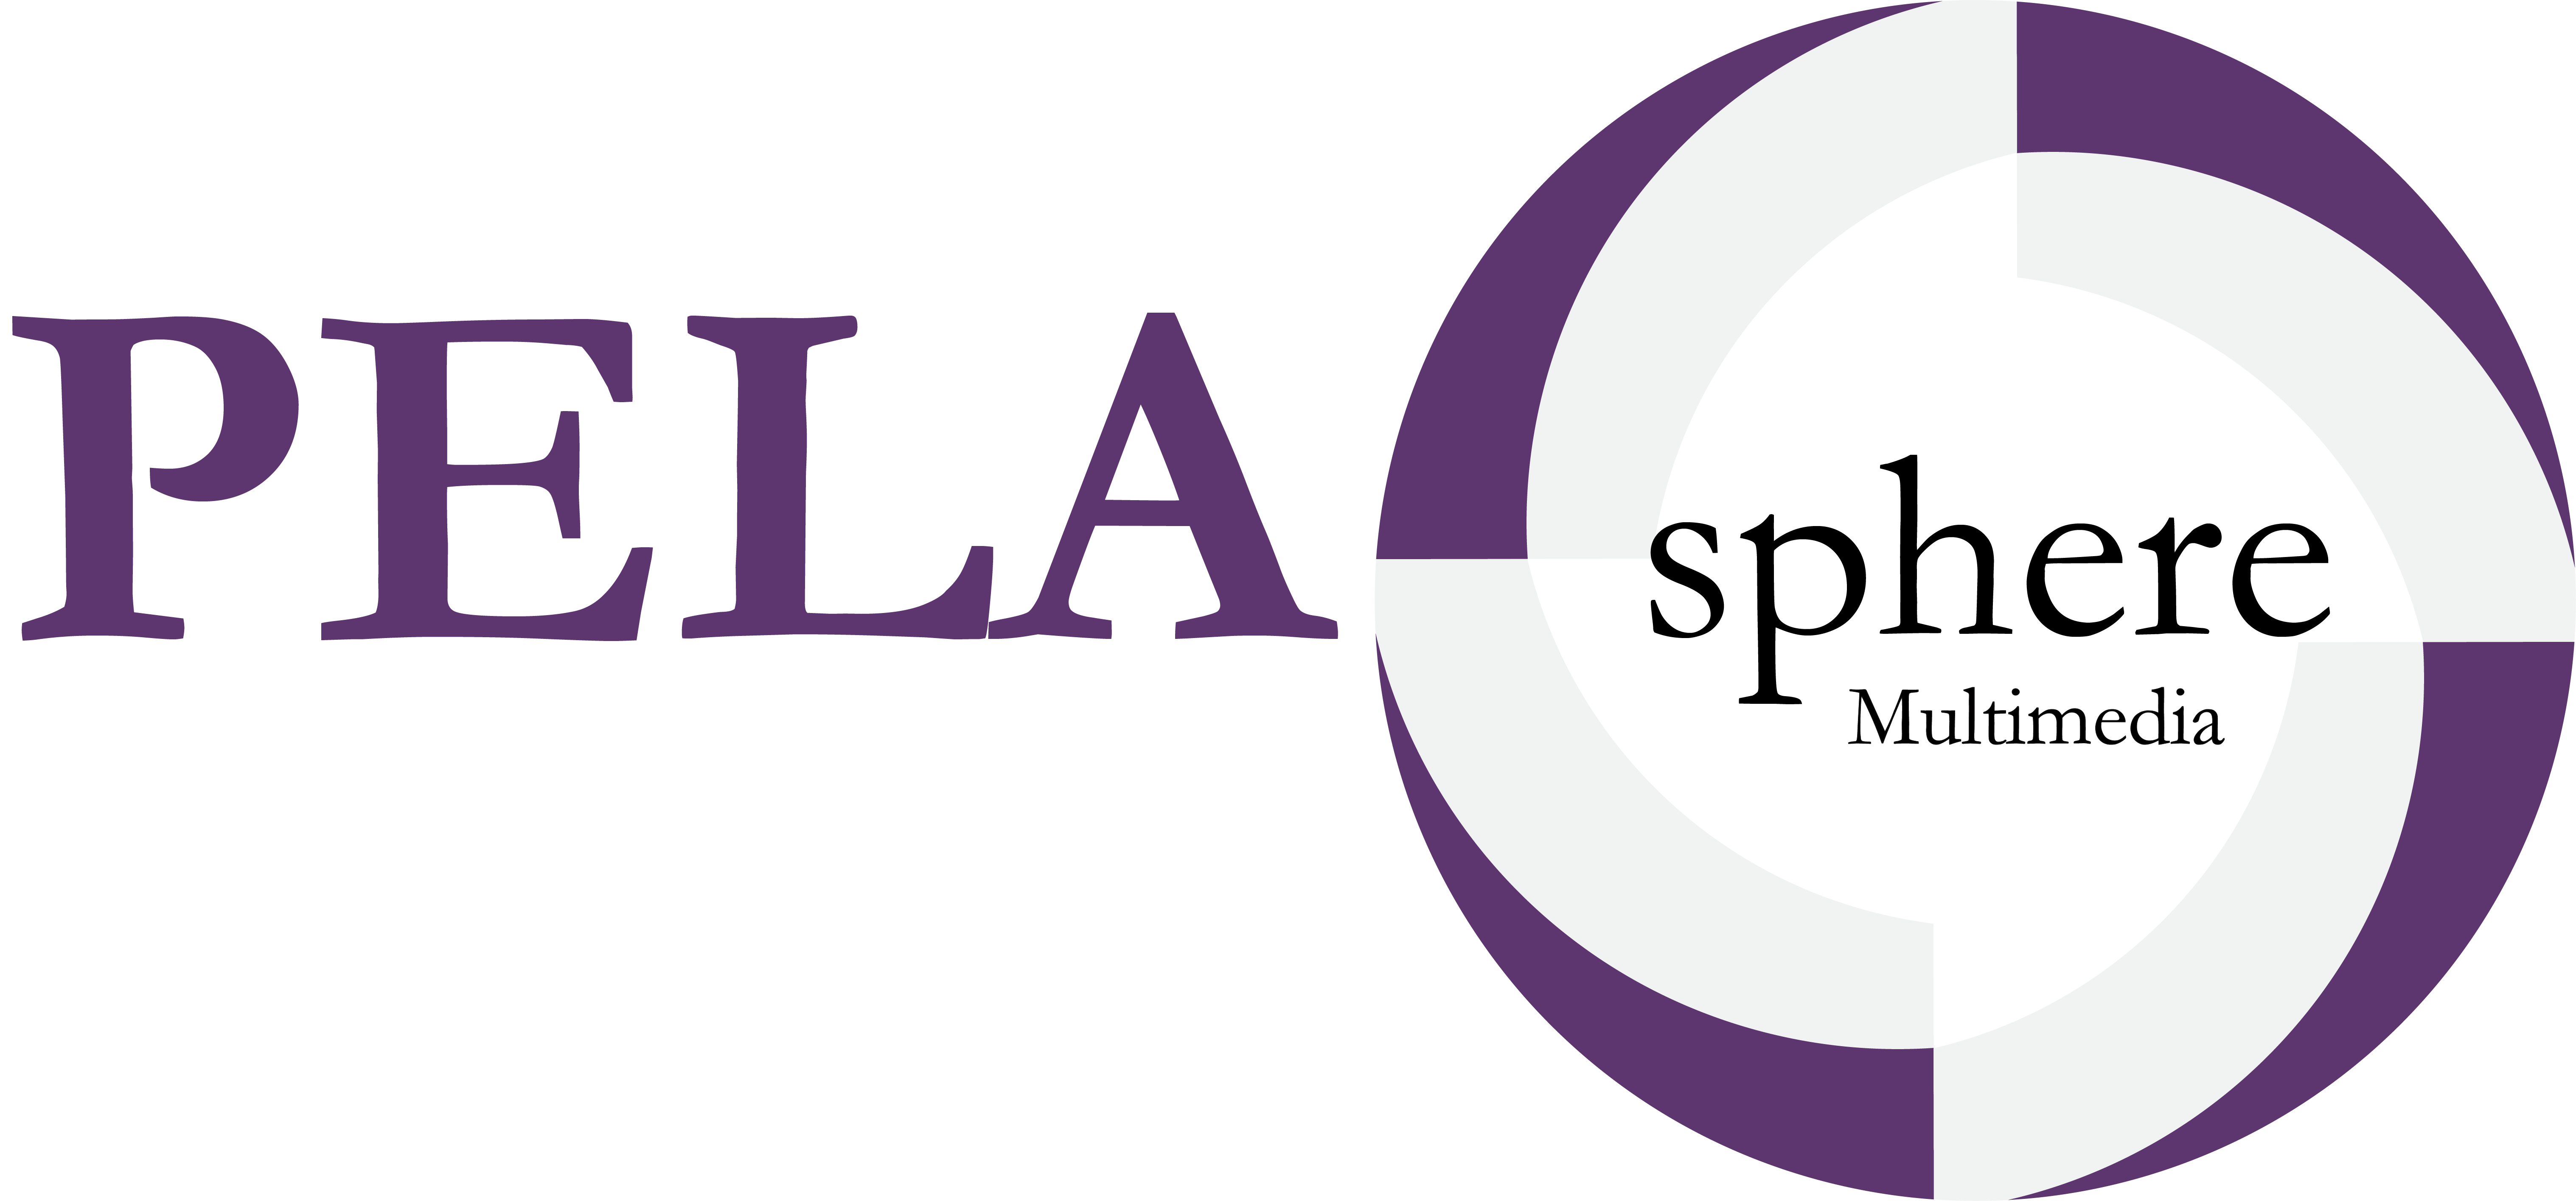 PELAsphere Multimedia Logo